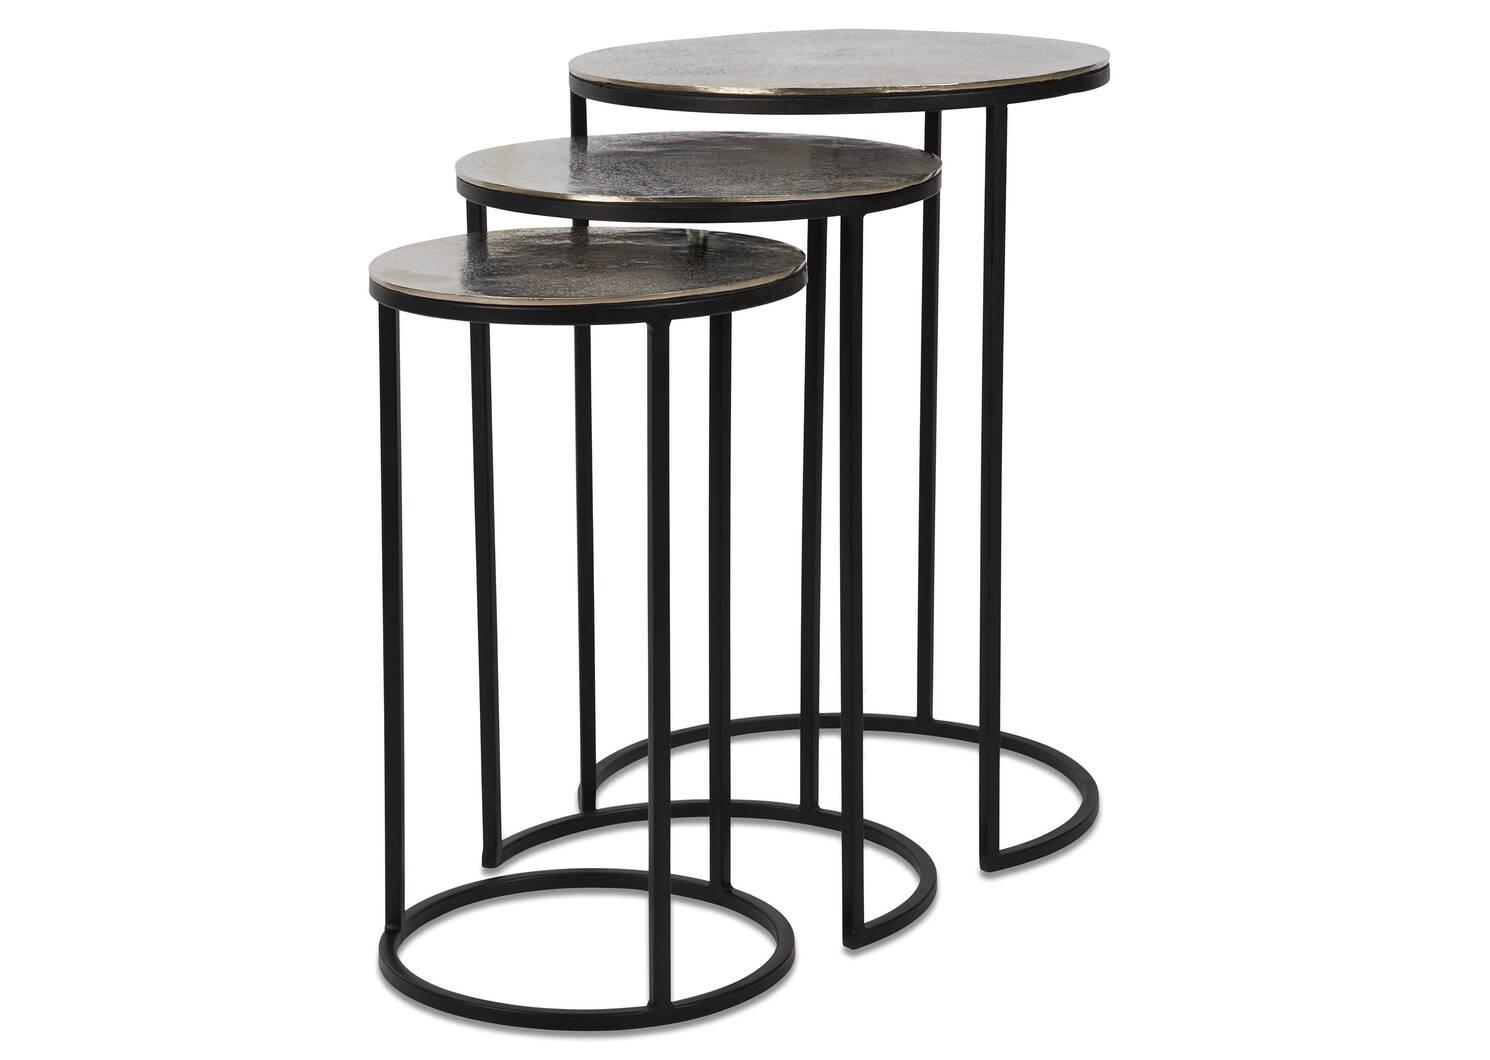 Mirri Nesting Tables -Raw Nickel